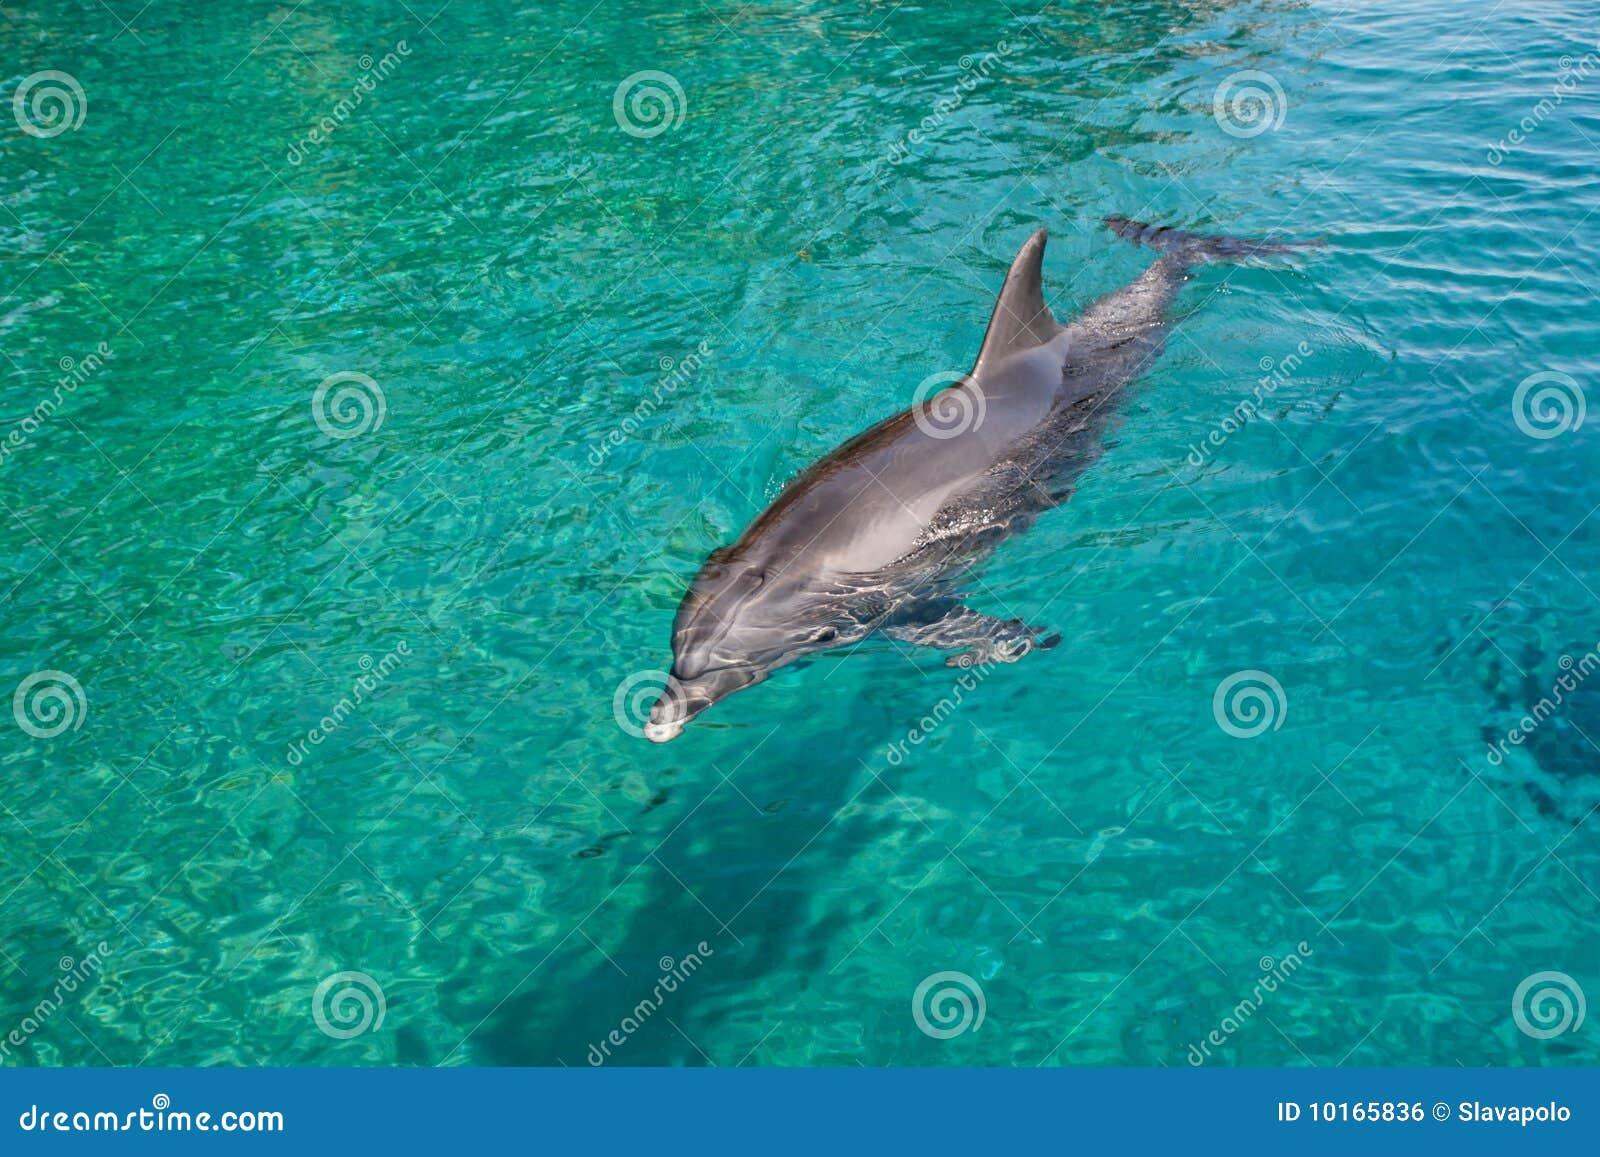 Clipart Sea Animals